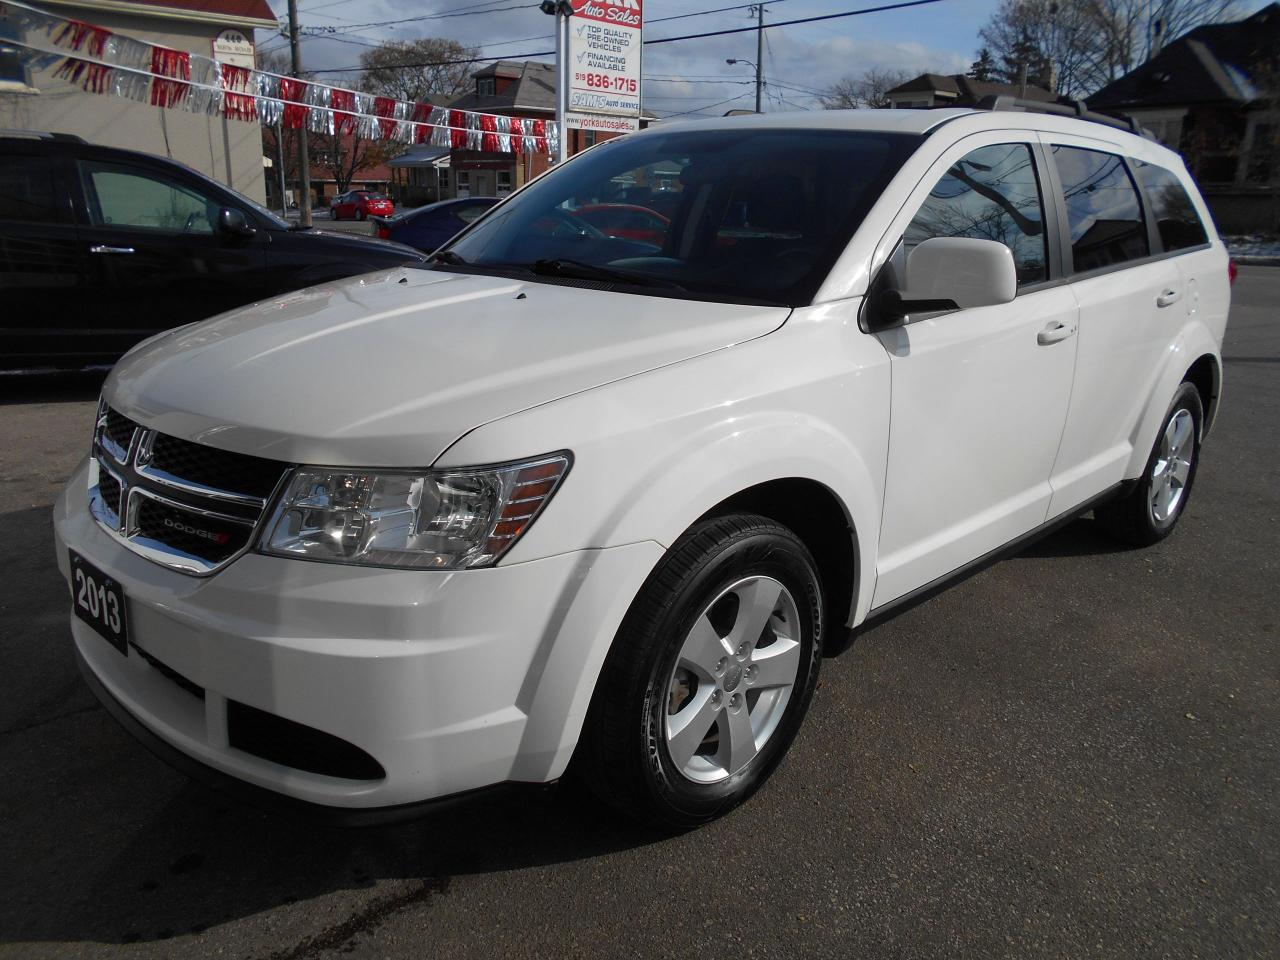 Photo of White 2013 Dodge Journey